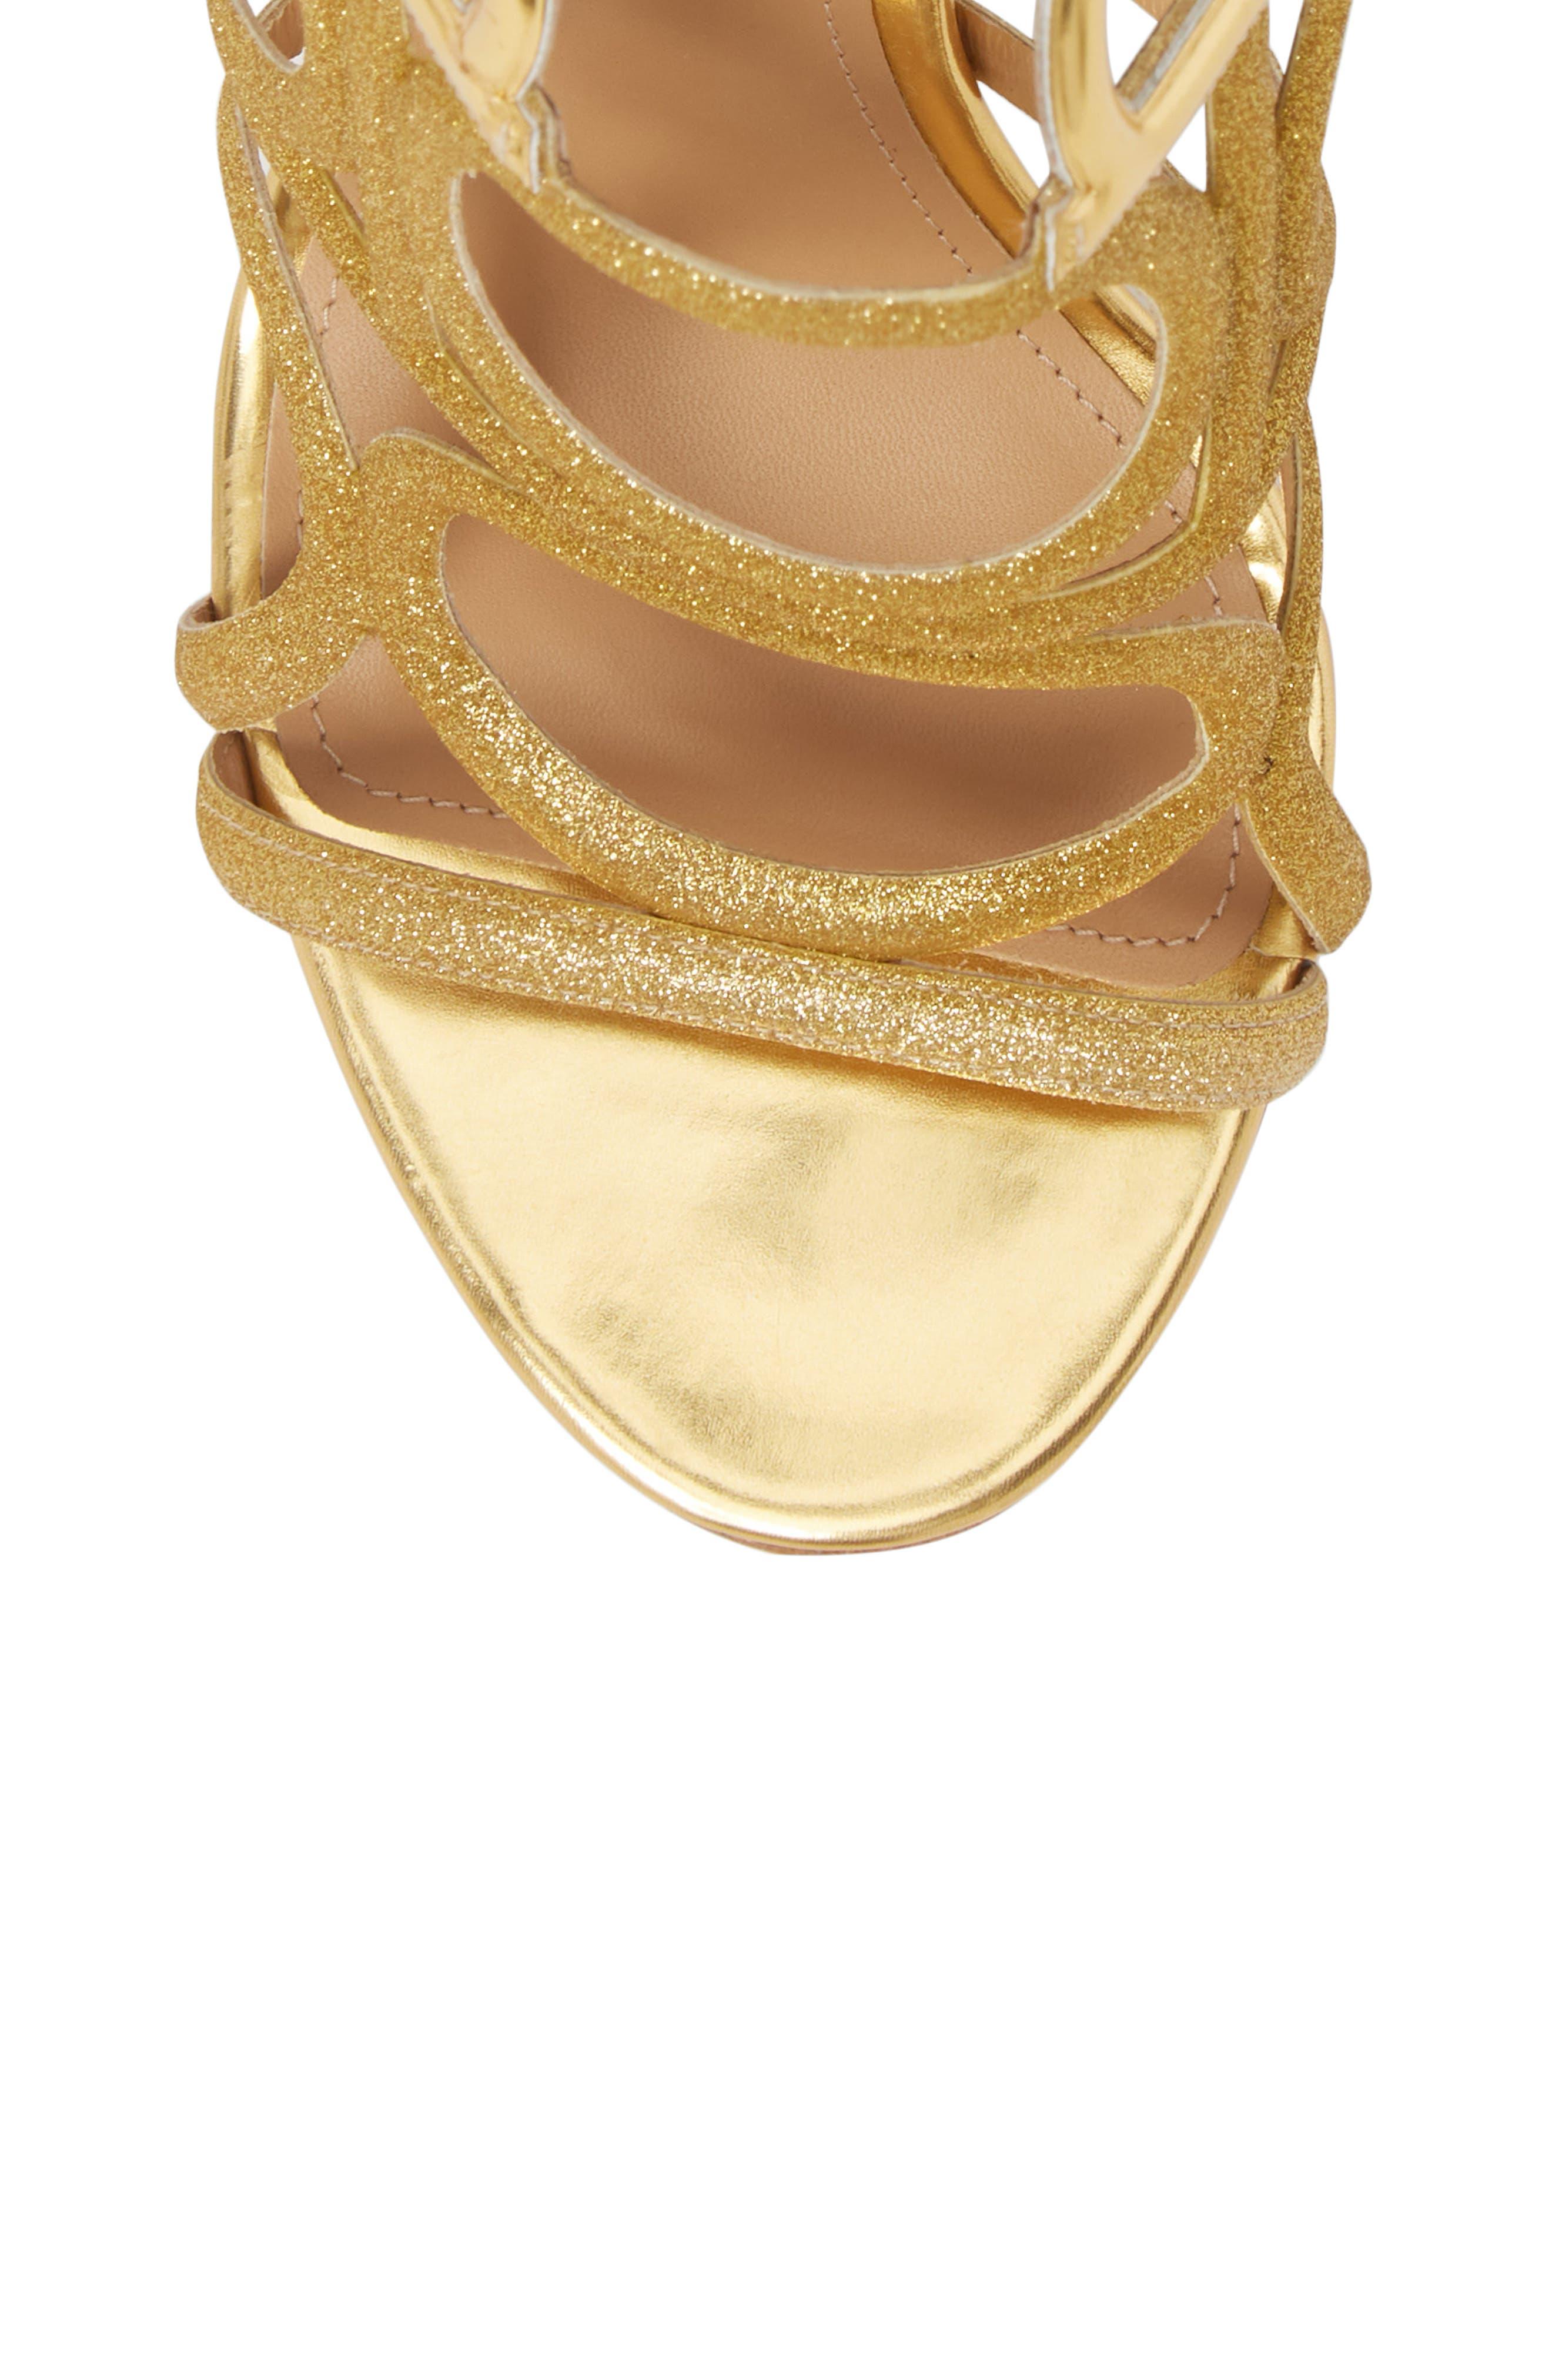 Vinci Lace-Up Heeled Sandal,                             Alternate thumbnail 5, color,                             710